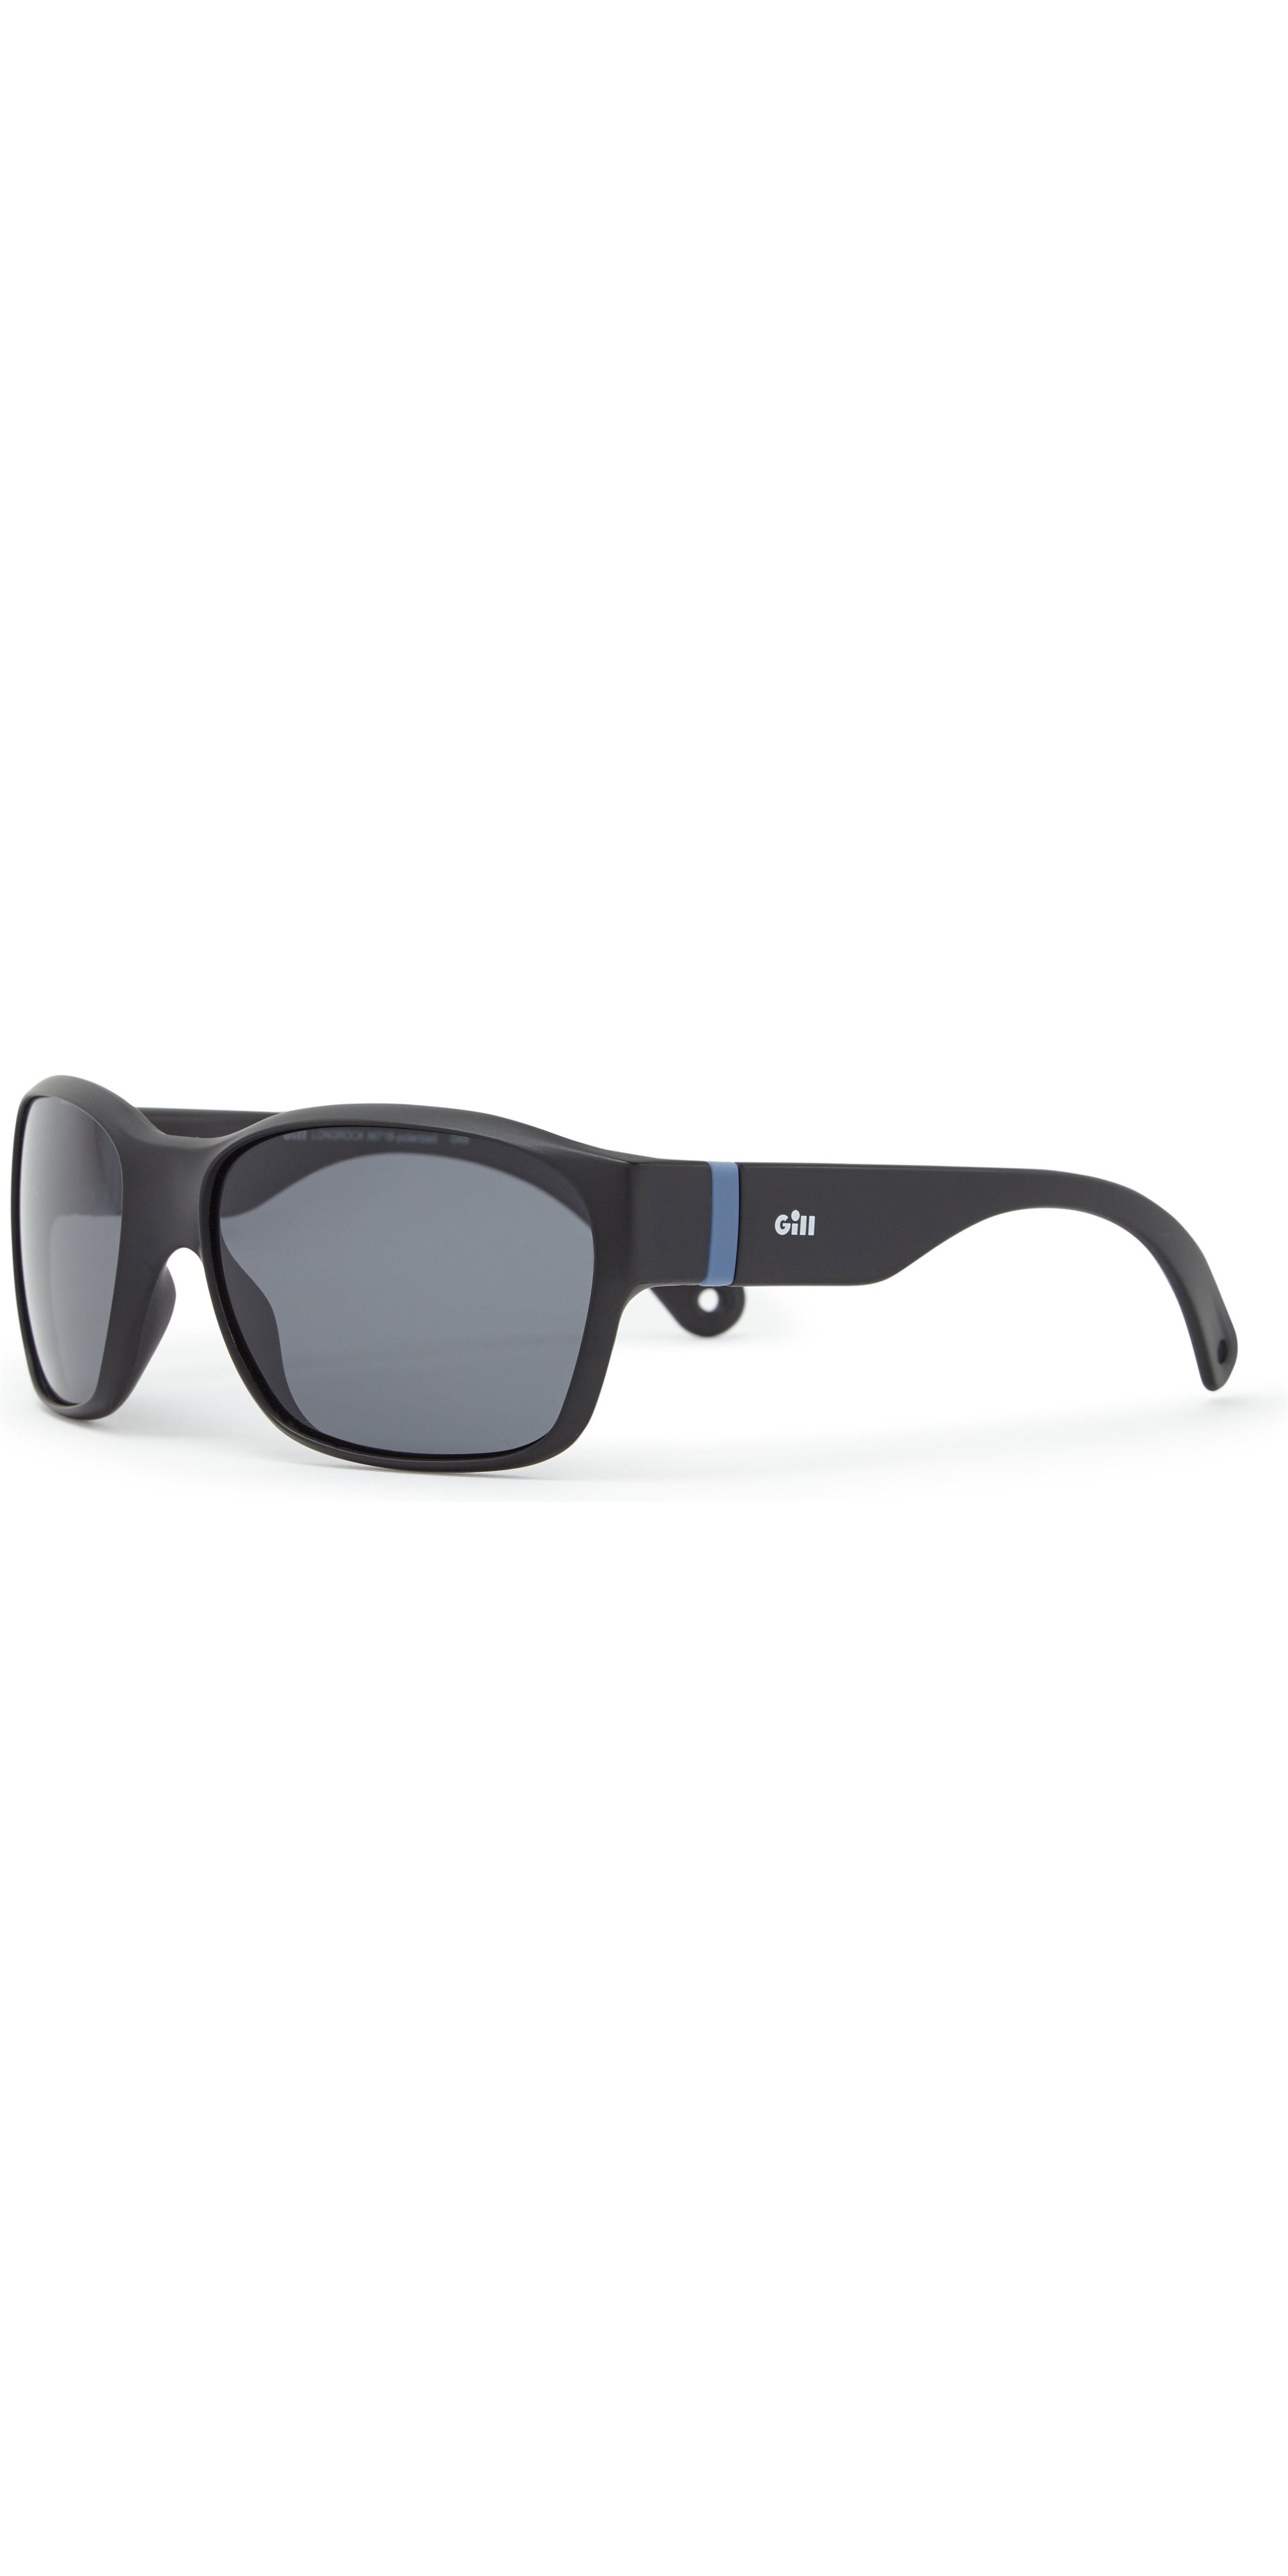 2019 Gill Junior Longrock Sunglasses Black / Smoke 9671